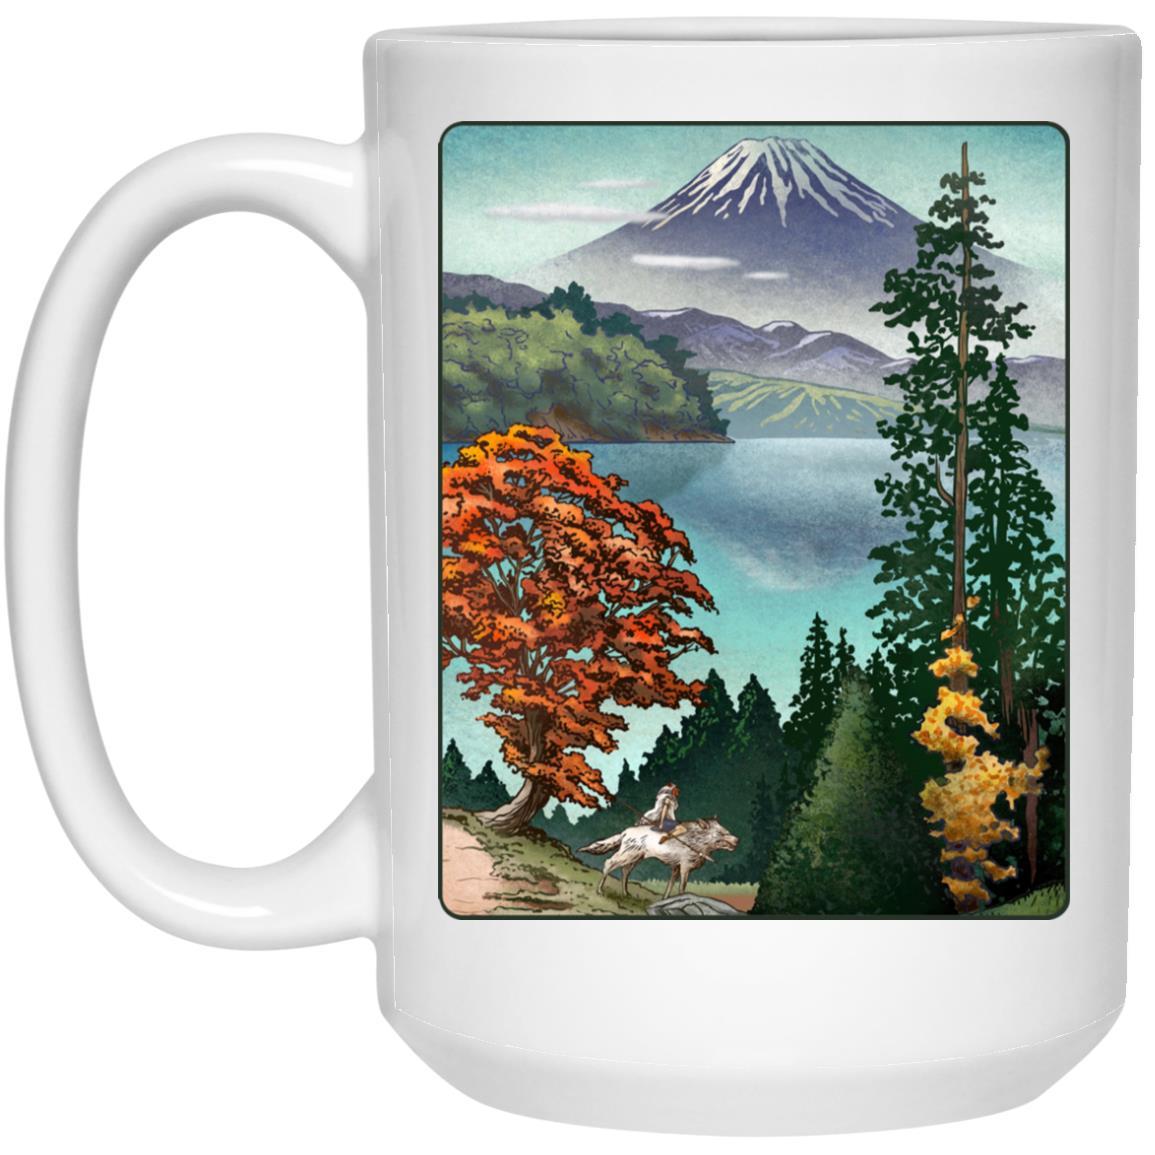 Princess Mononoke Landscape Mug